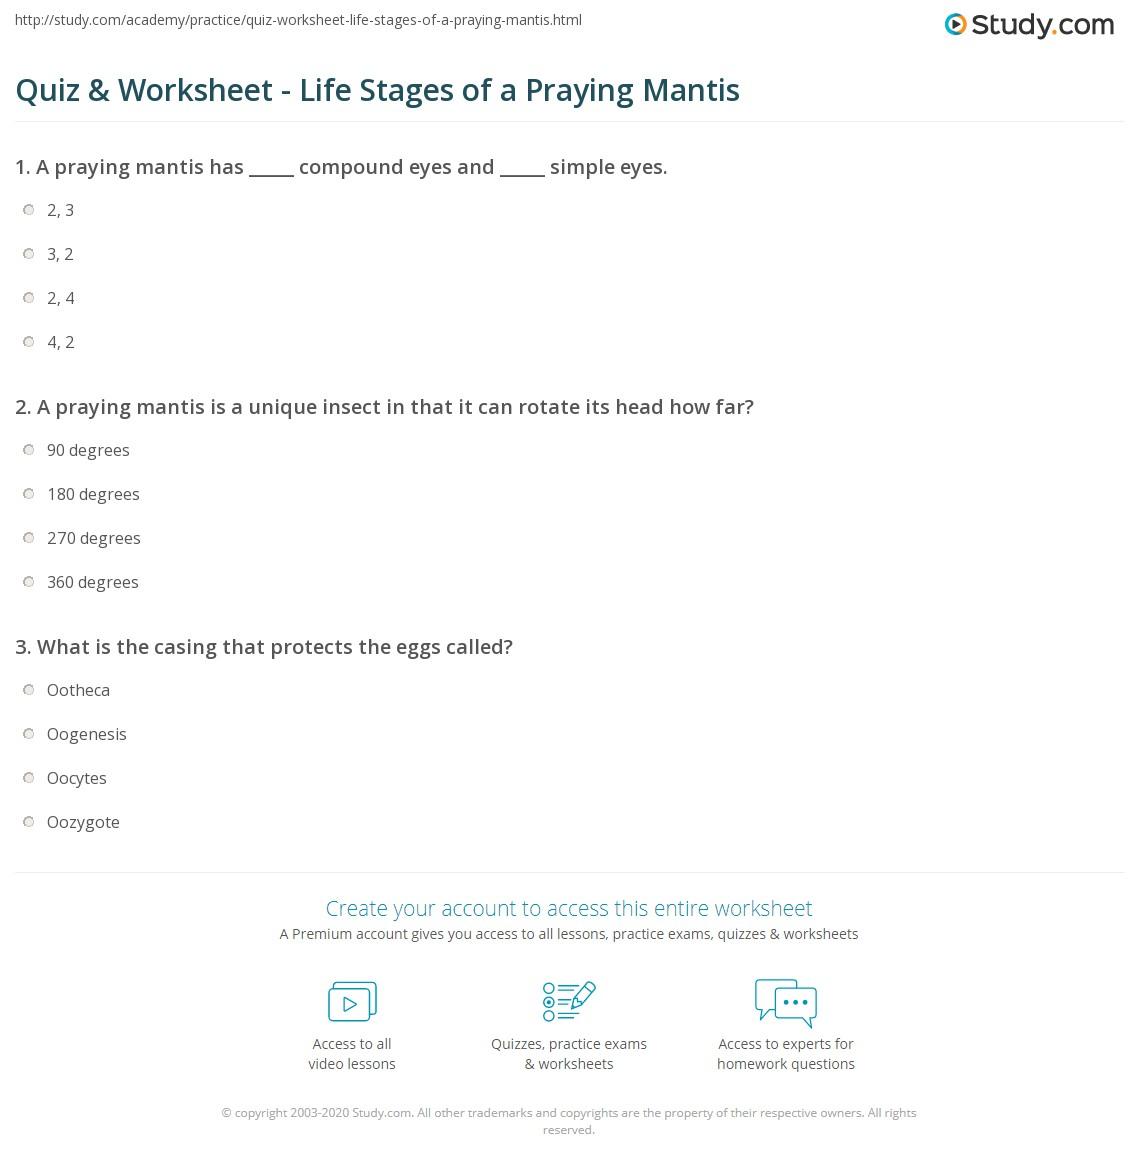 Quiz & Worksheet - Life Stages of a Praying Mantis | Study.com